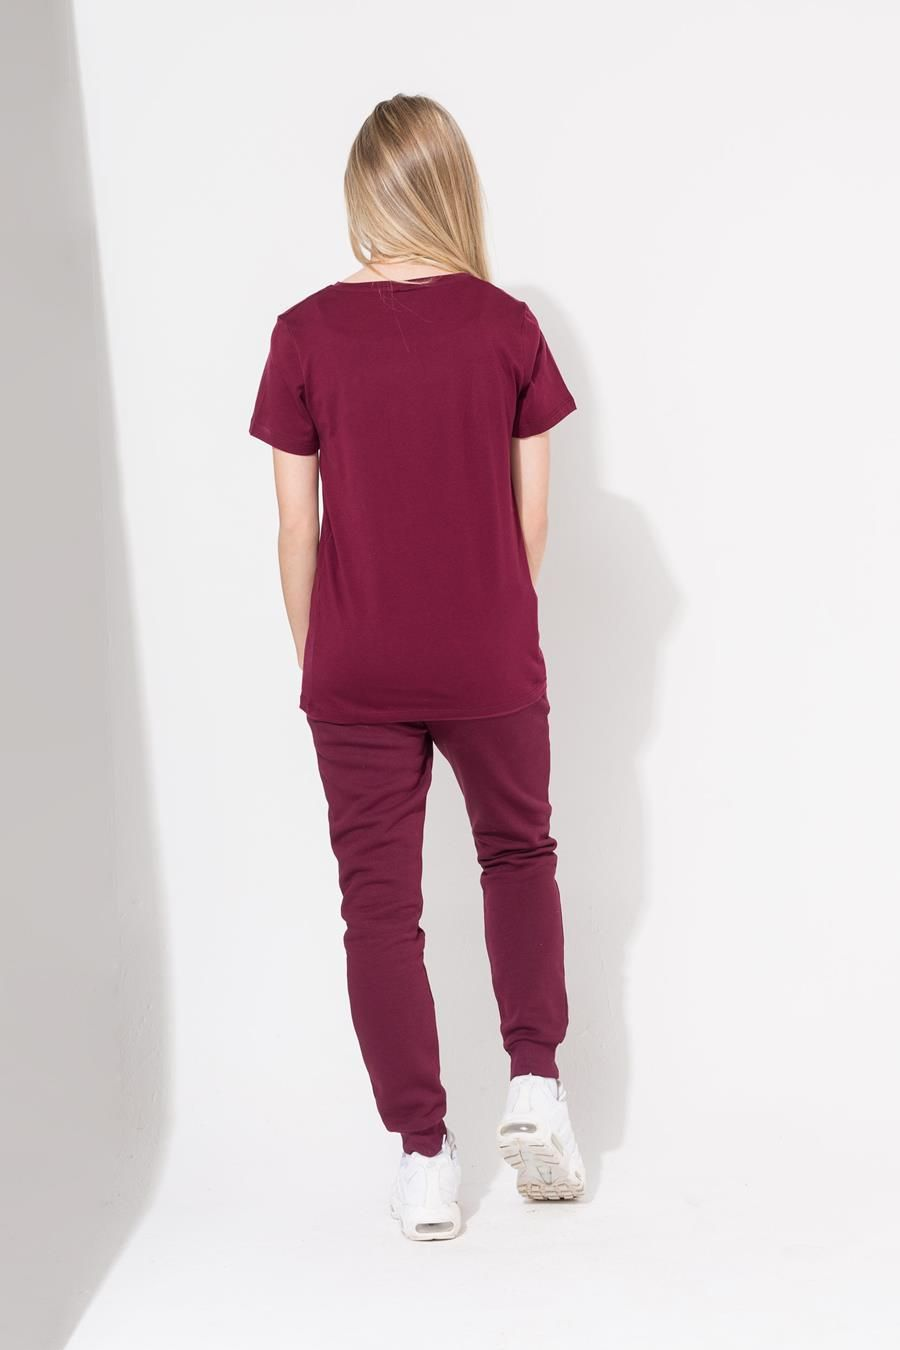 Hype Burgundy Crest Kids T-Shirt